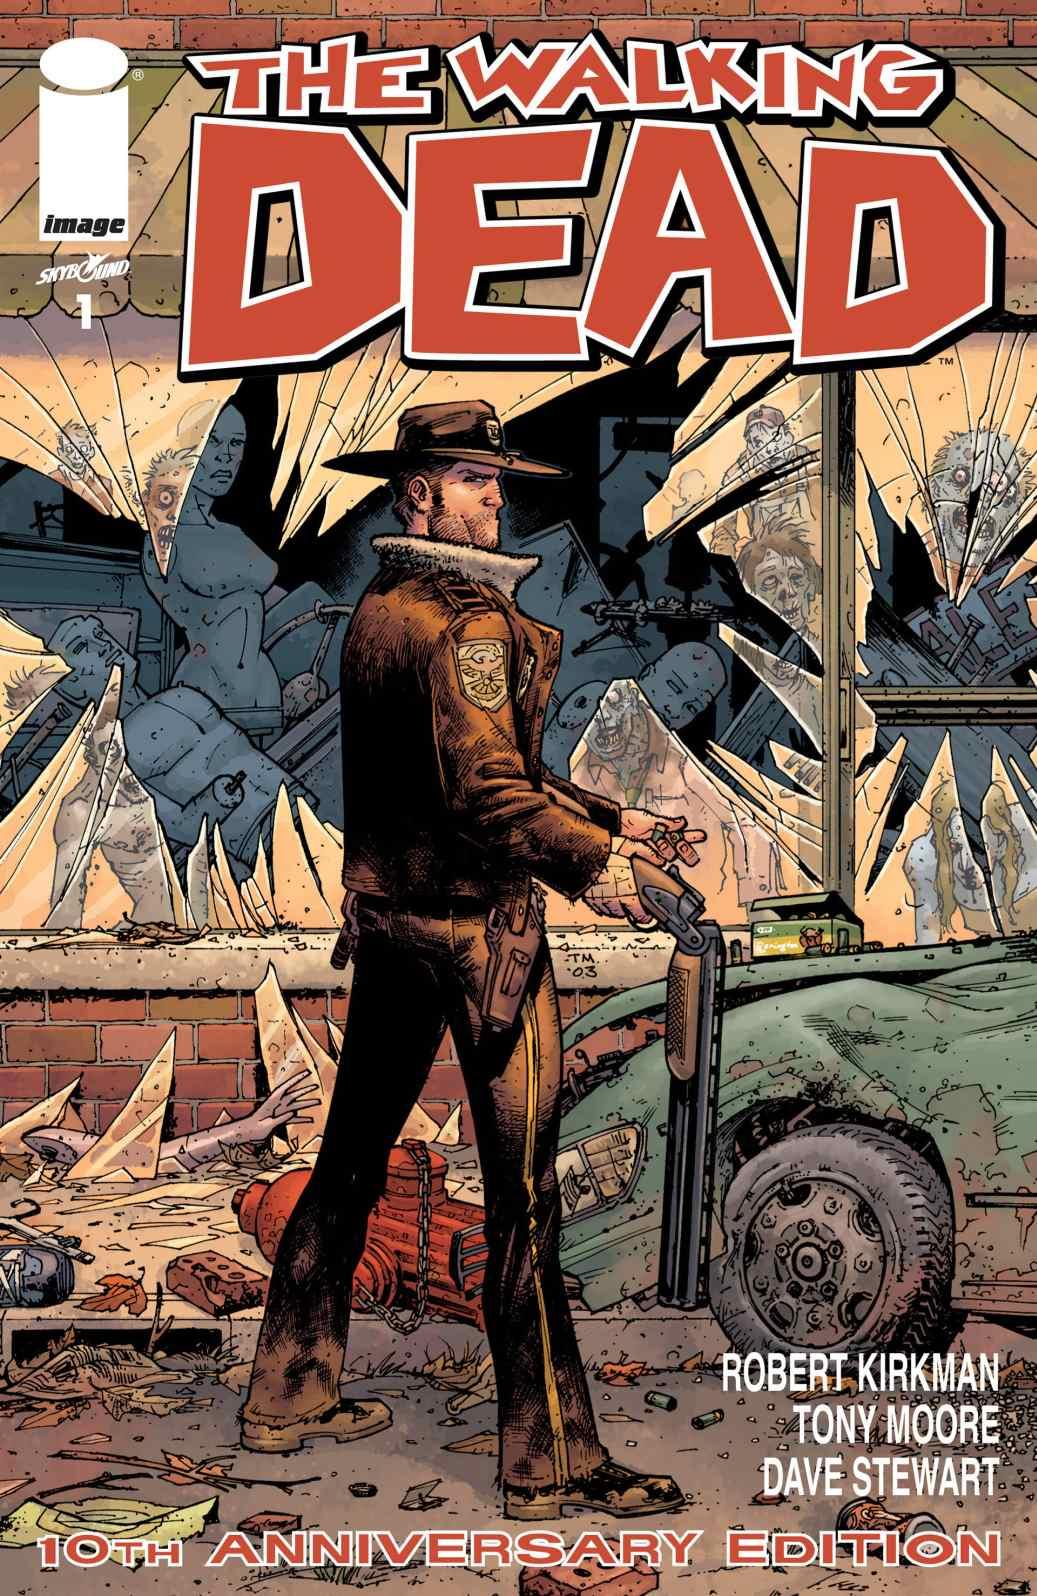 Read Comics Online Free - The Walking Dead - Chapter 001